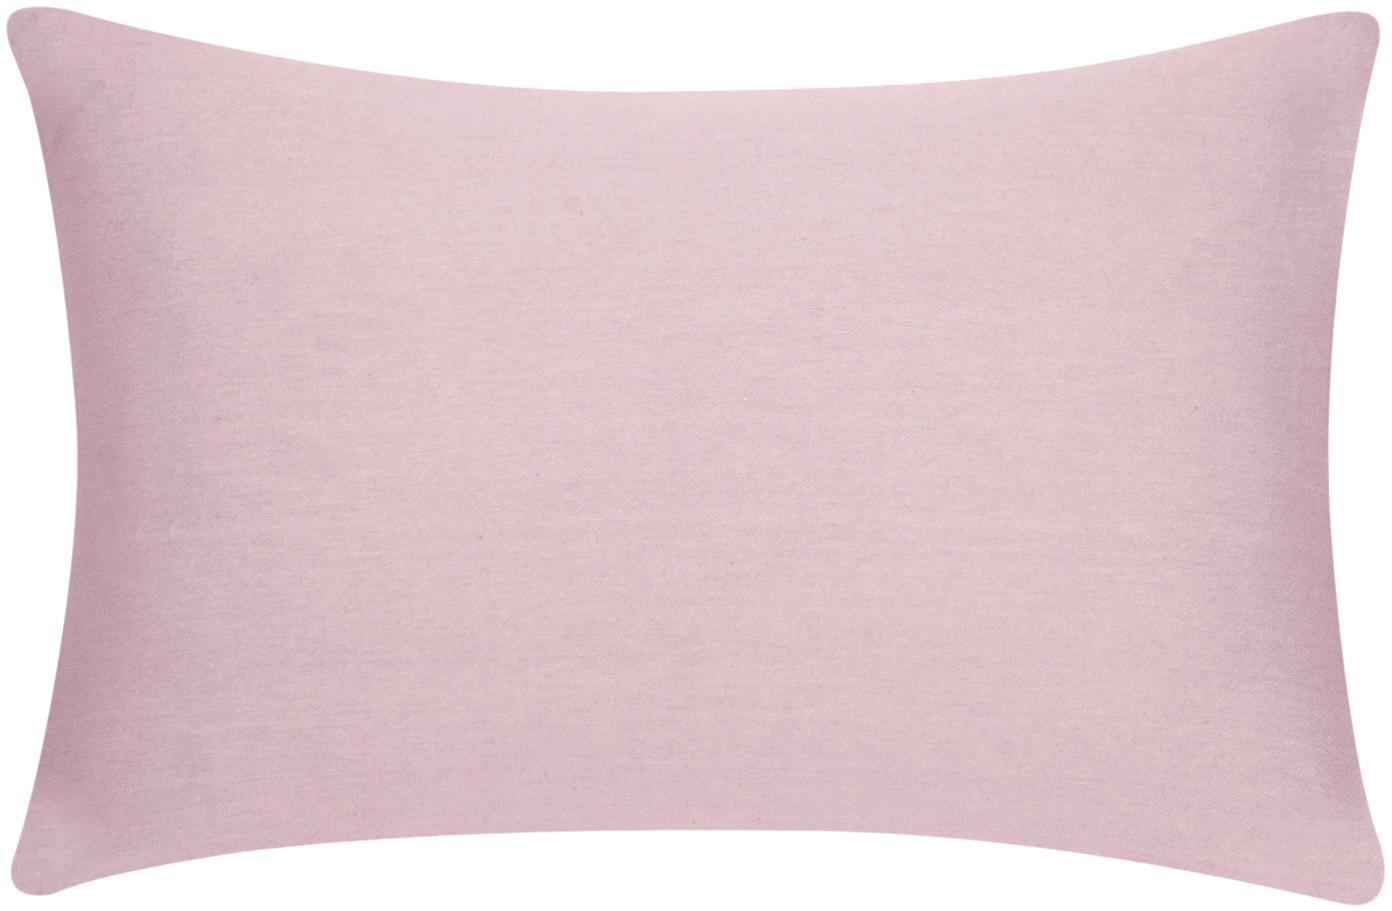 Federa arredo in cotone rosa Mads, 100% cotone, Rosa, Larg. 30 x Lung. 50 cm